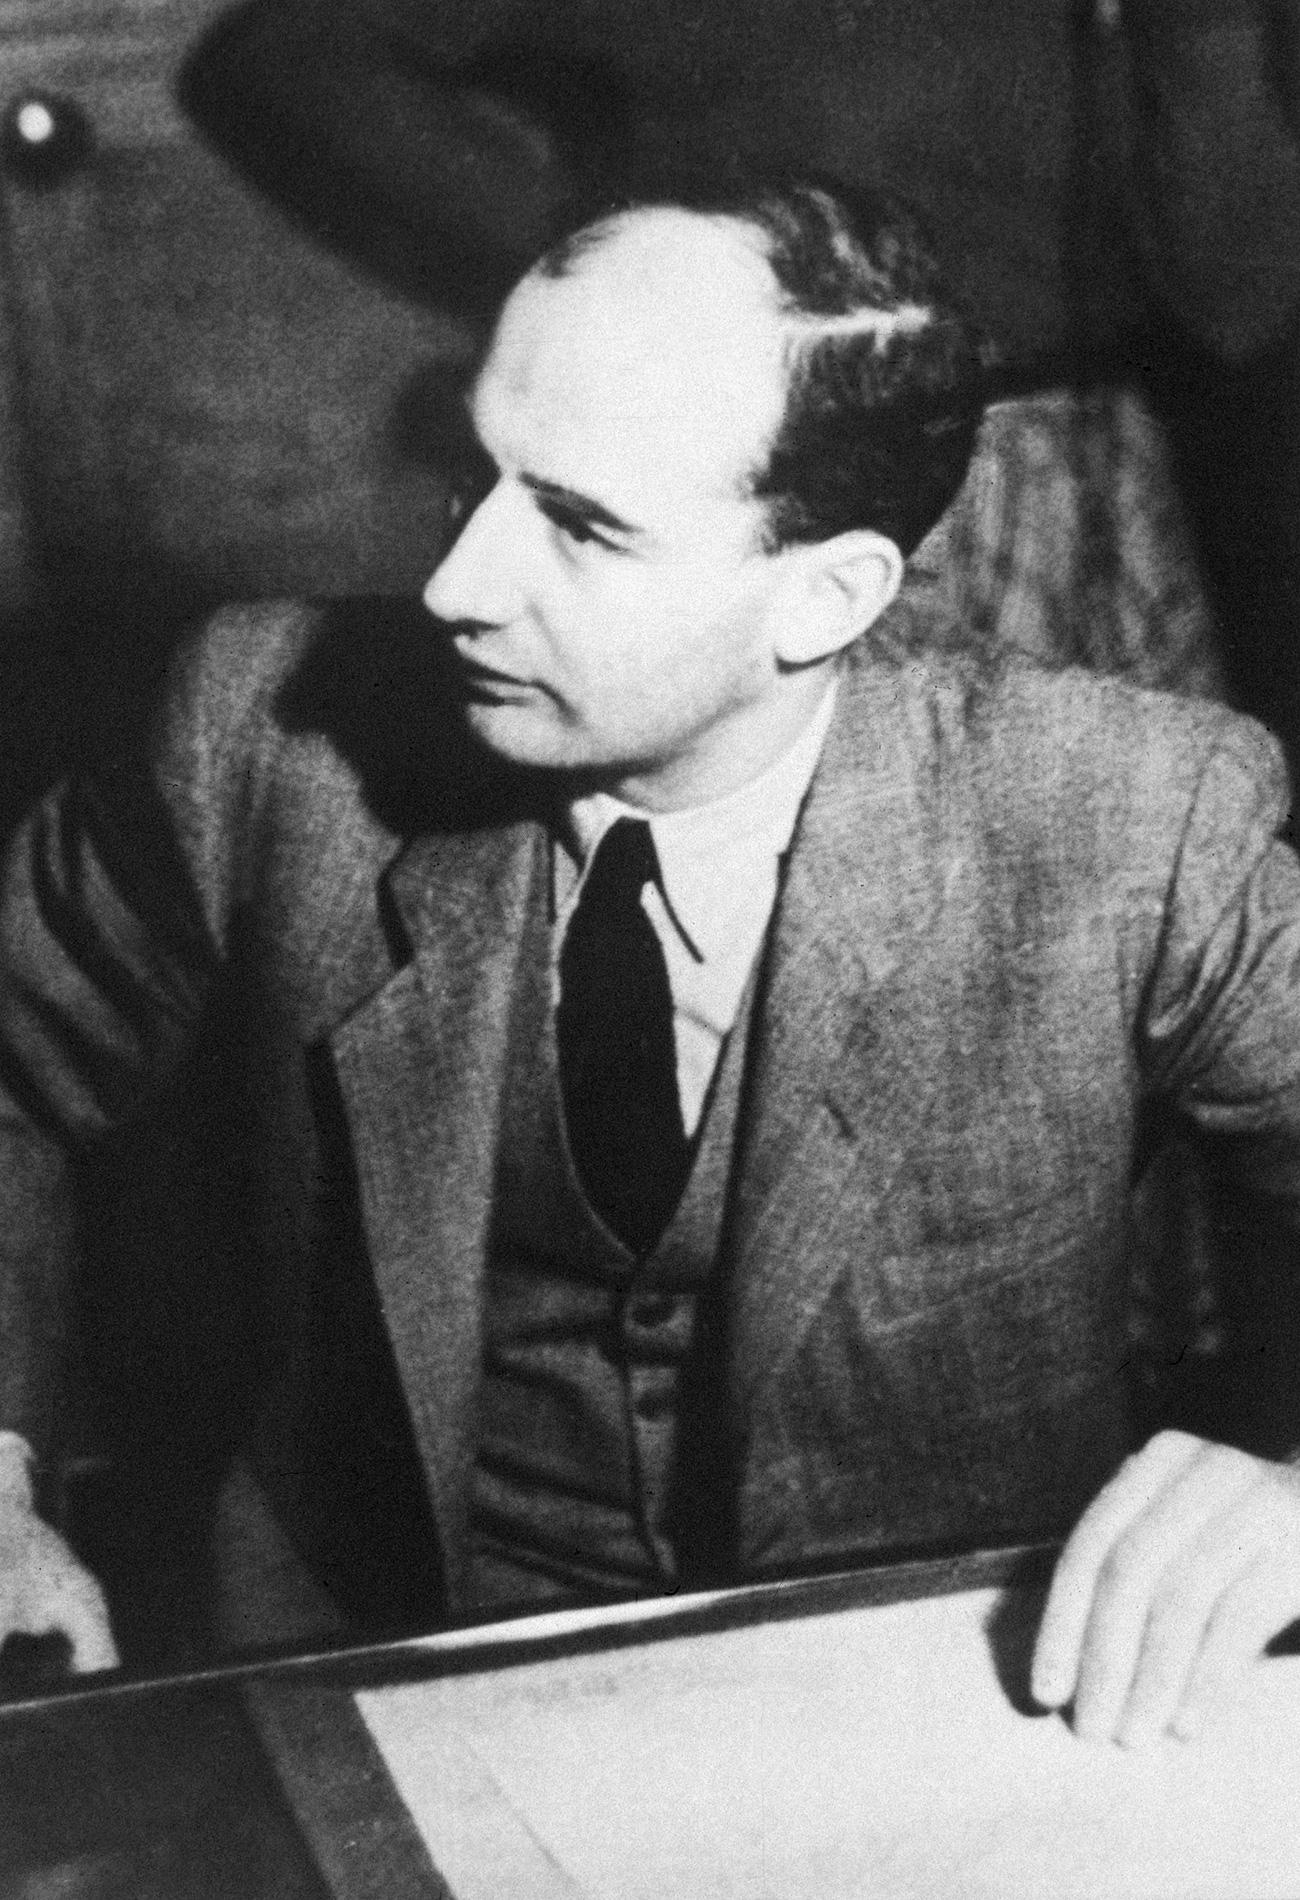 Raoul Wallenberg, posebni predstavnik Švedske v Budimpešti, 1944. Izvor: Getty Images.